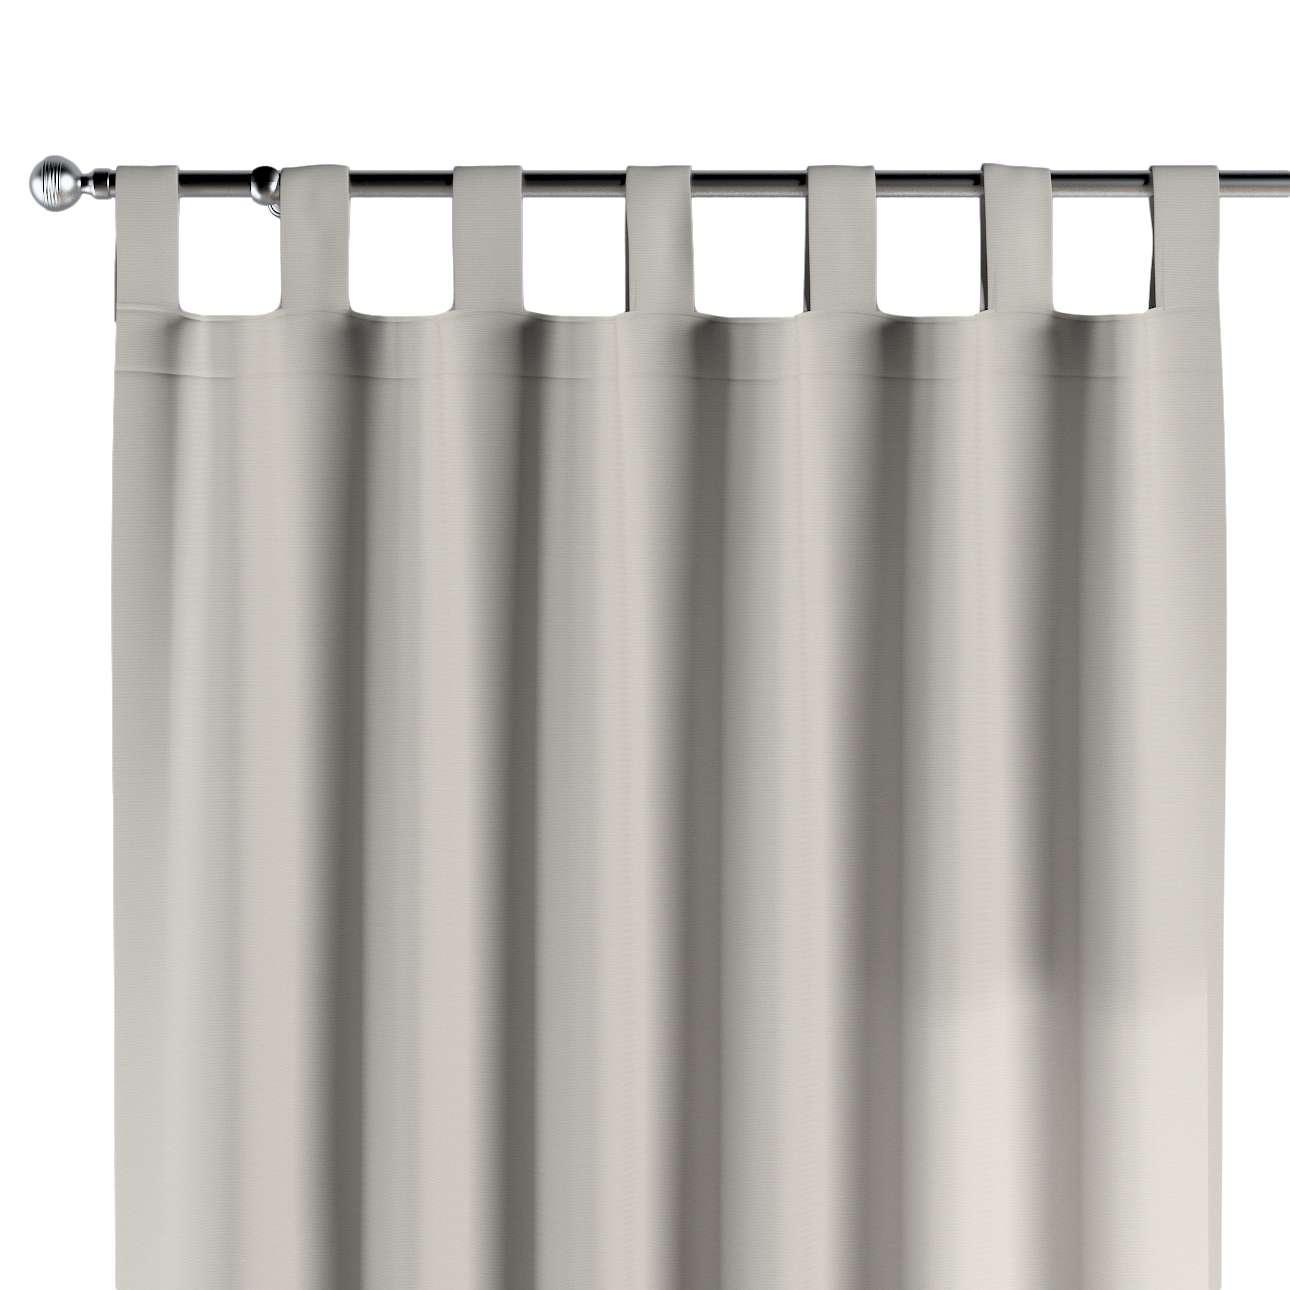 Gardin med stropper 130 x 260 cm fra kollektionen Cotton Panama, Stof: 702-31